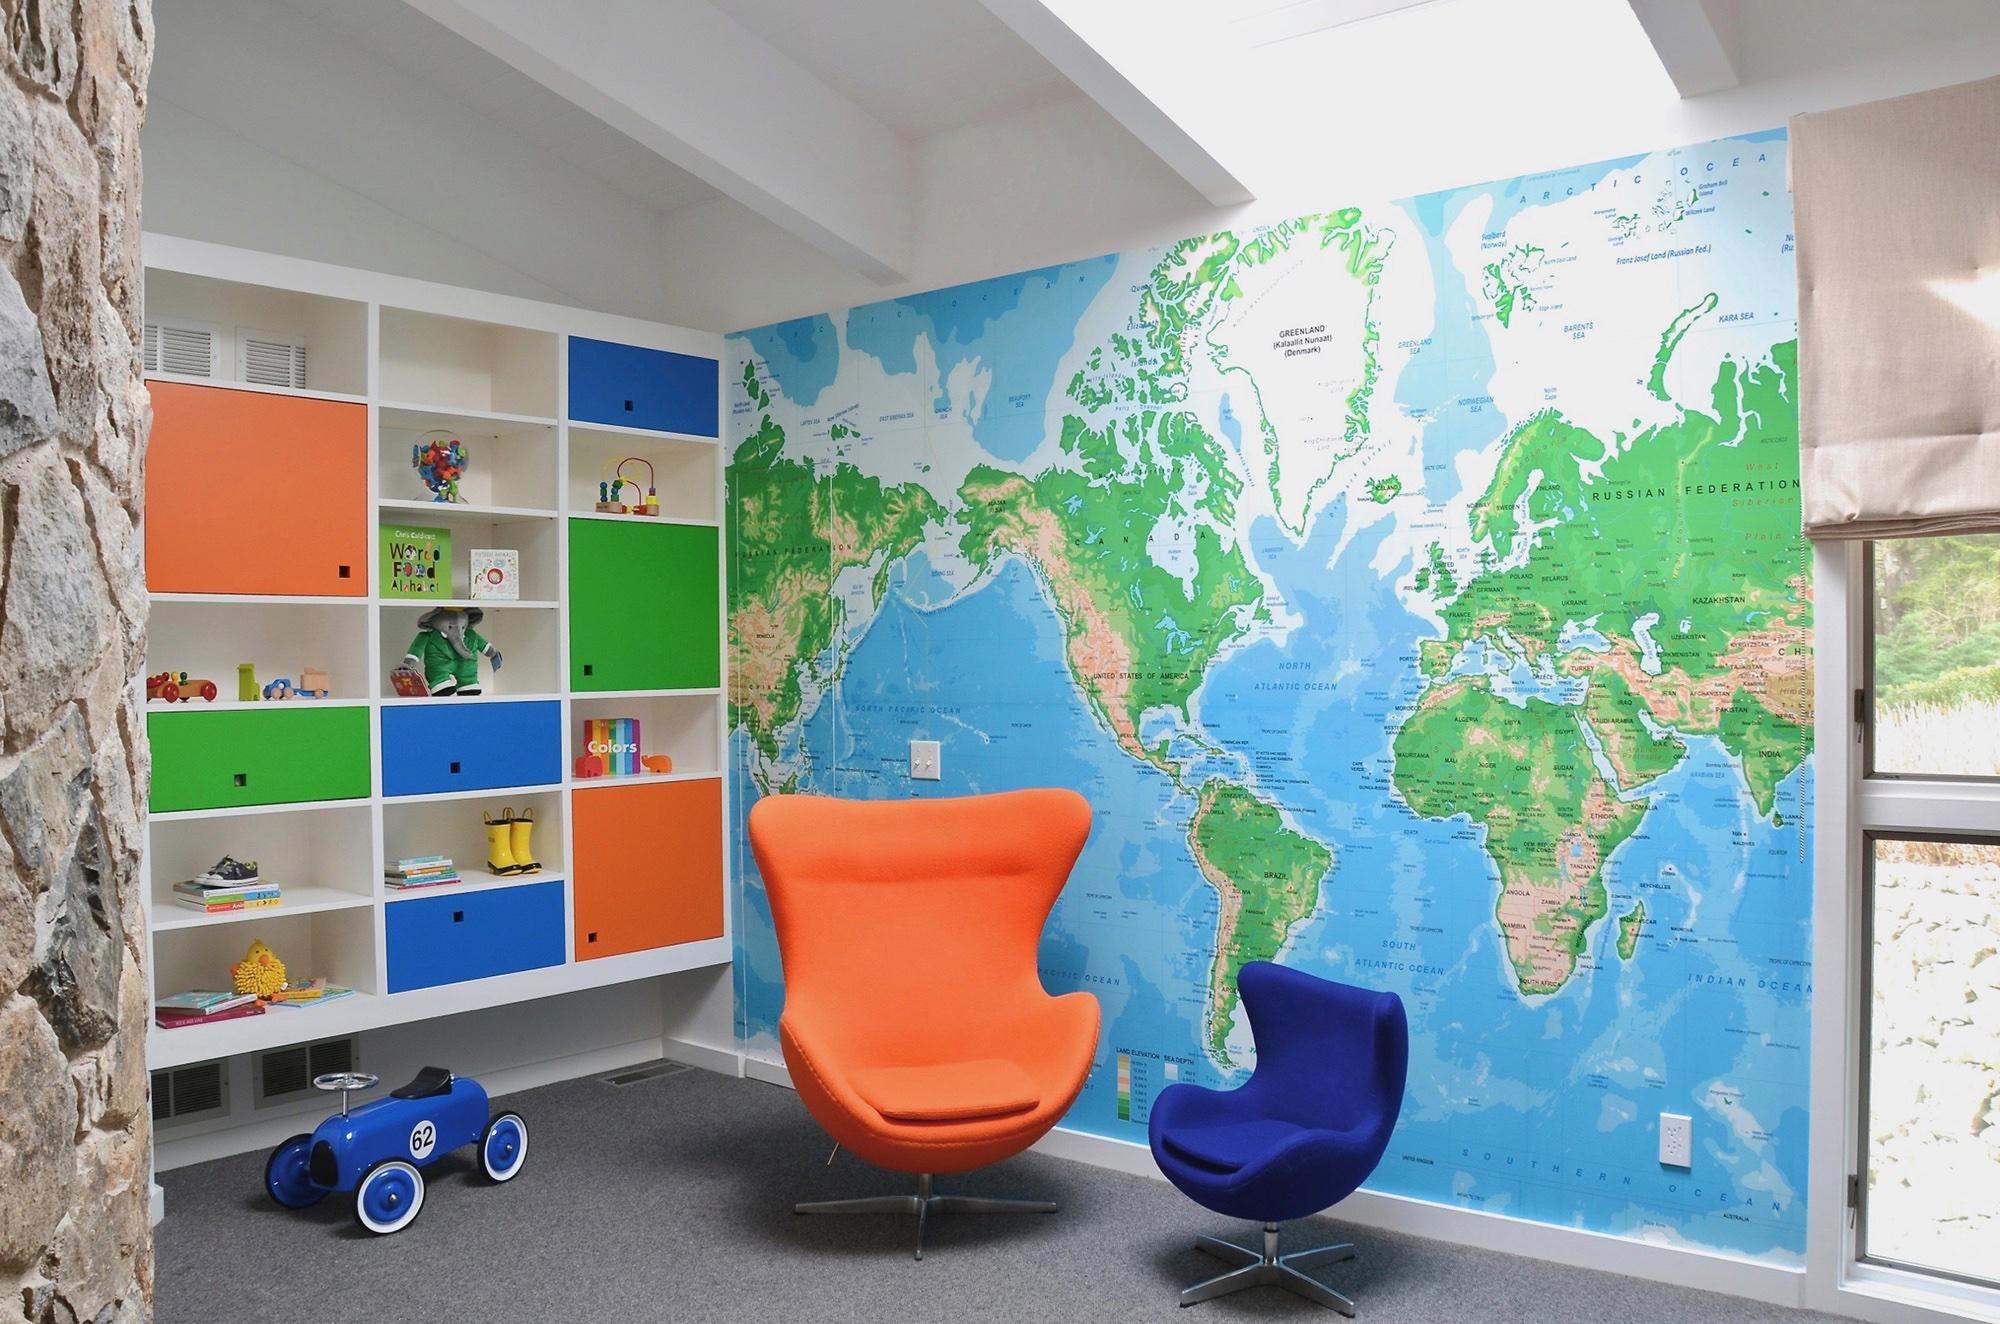 interiors-kids-are-people-new-17 copy 2 4.jpg